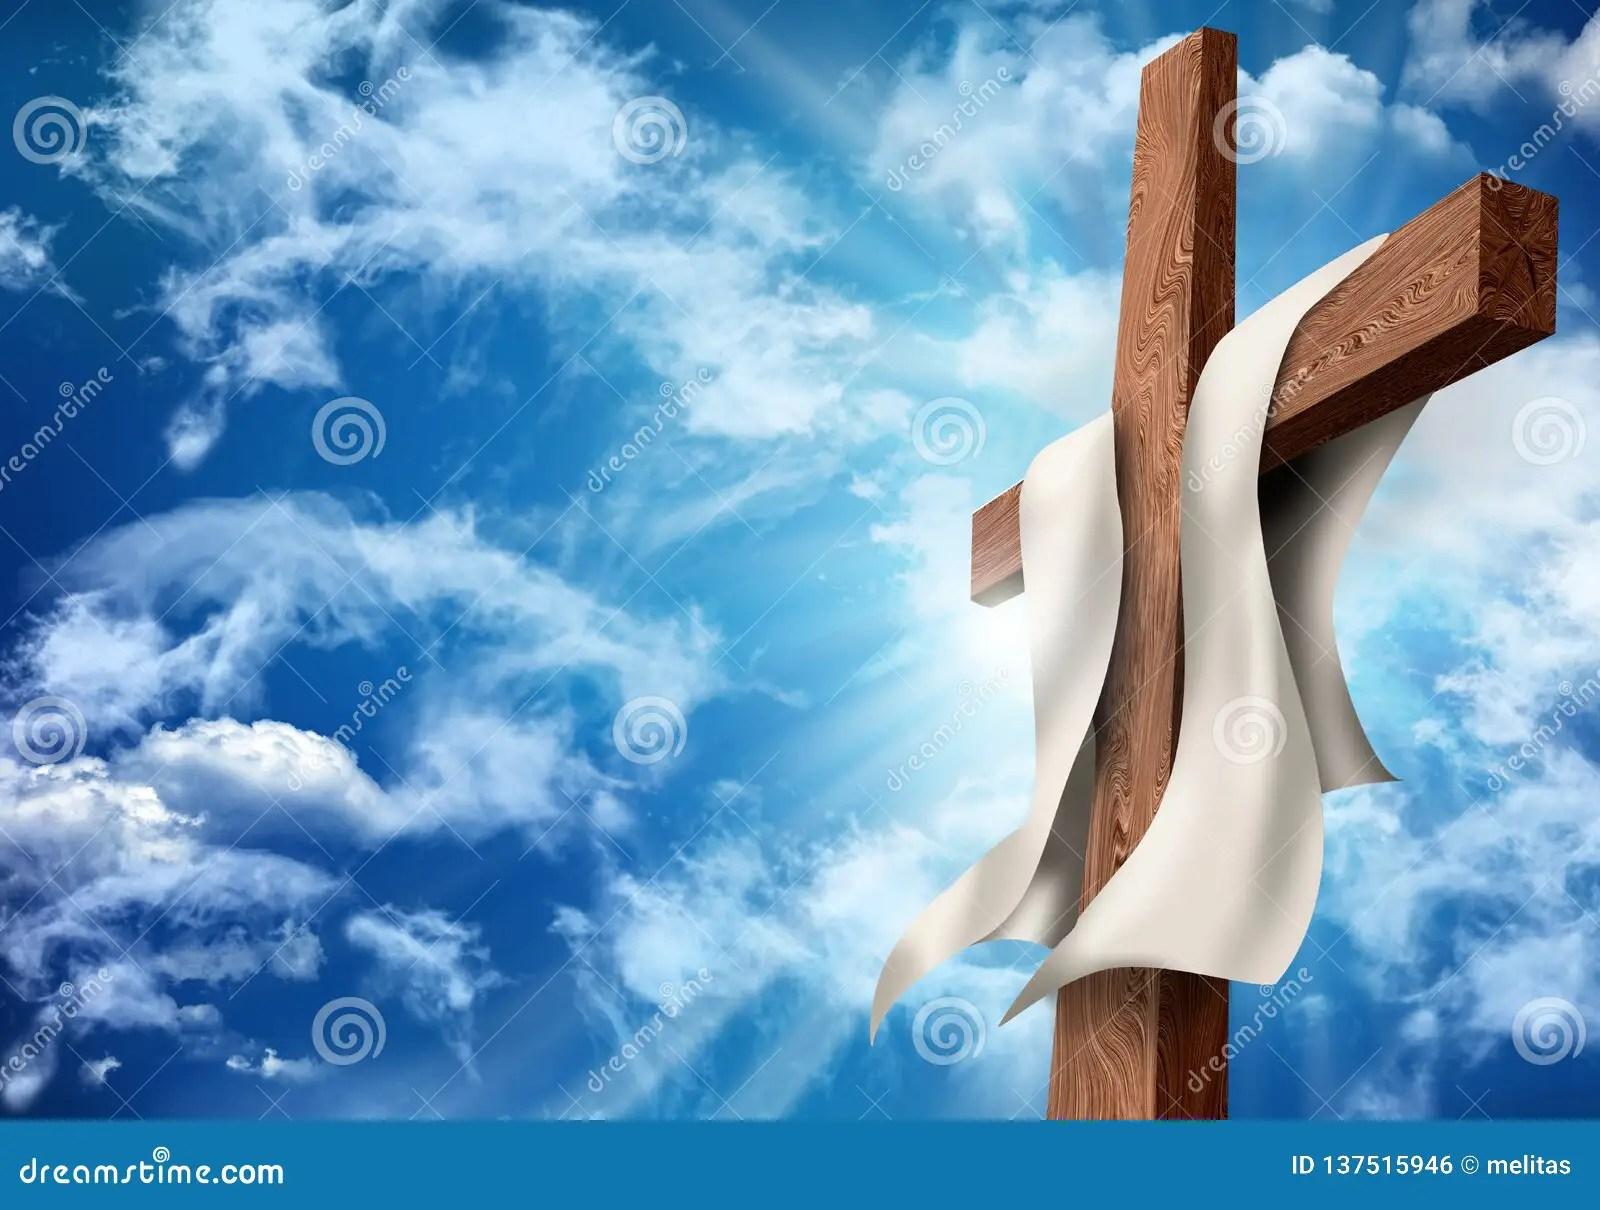 resurrection or crucifixion christian